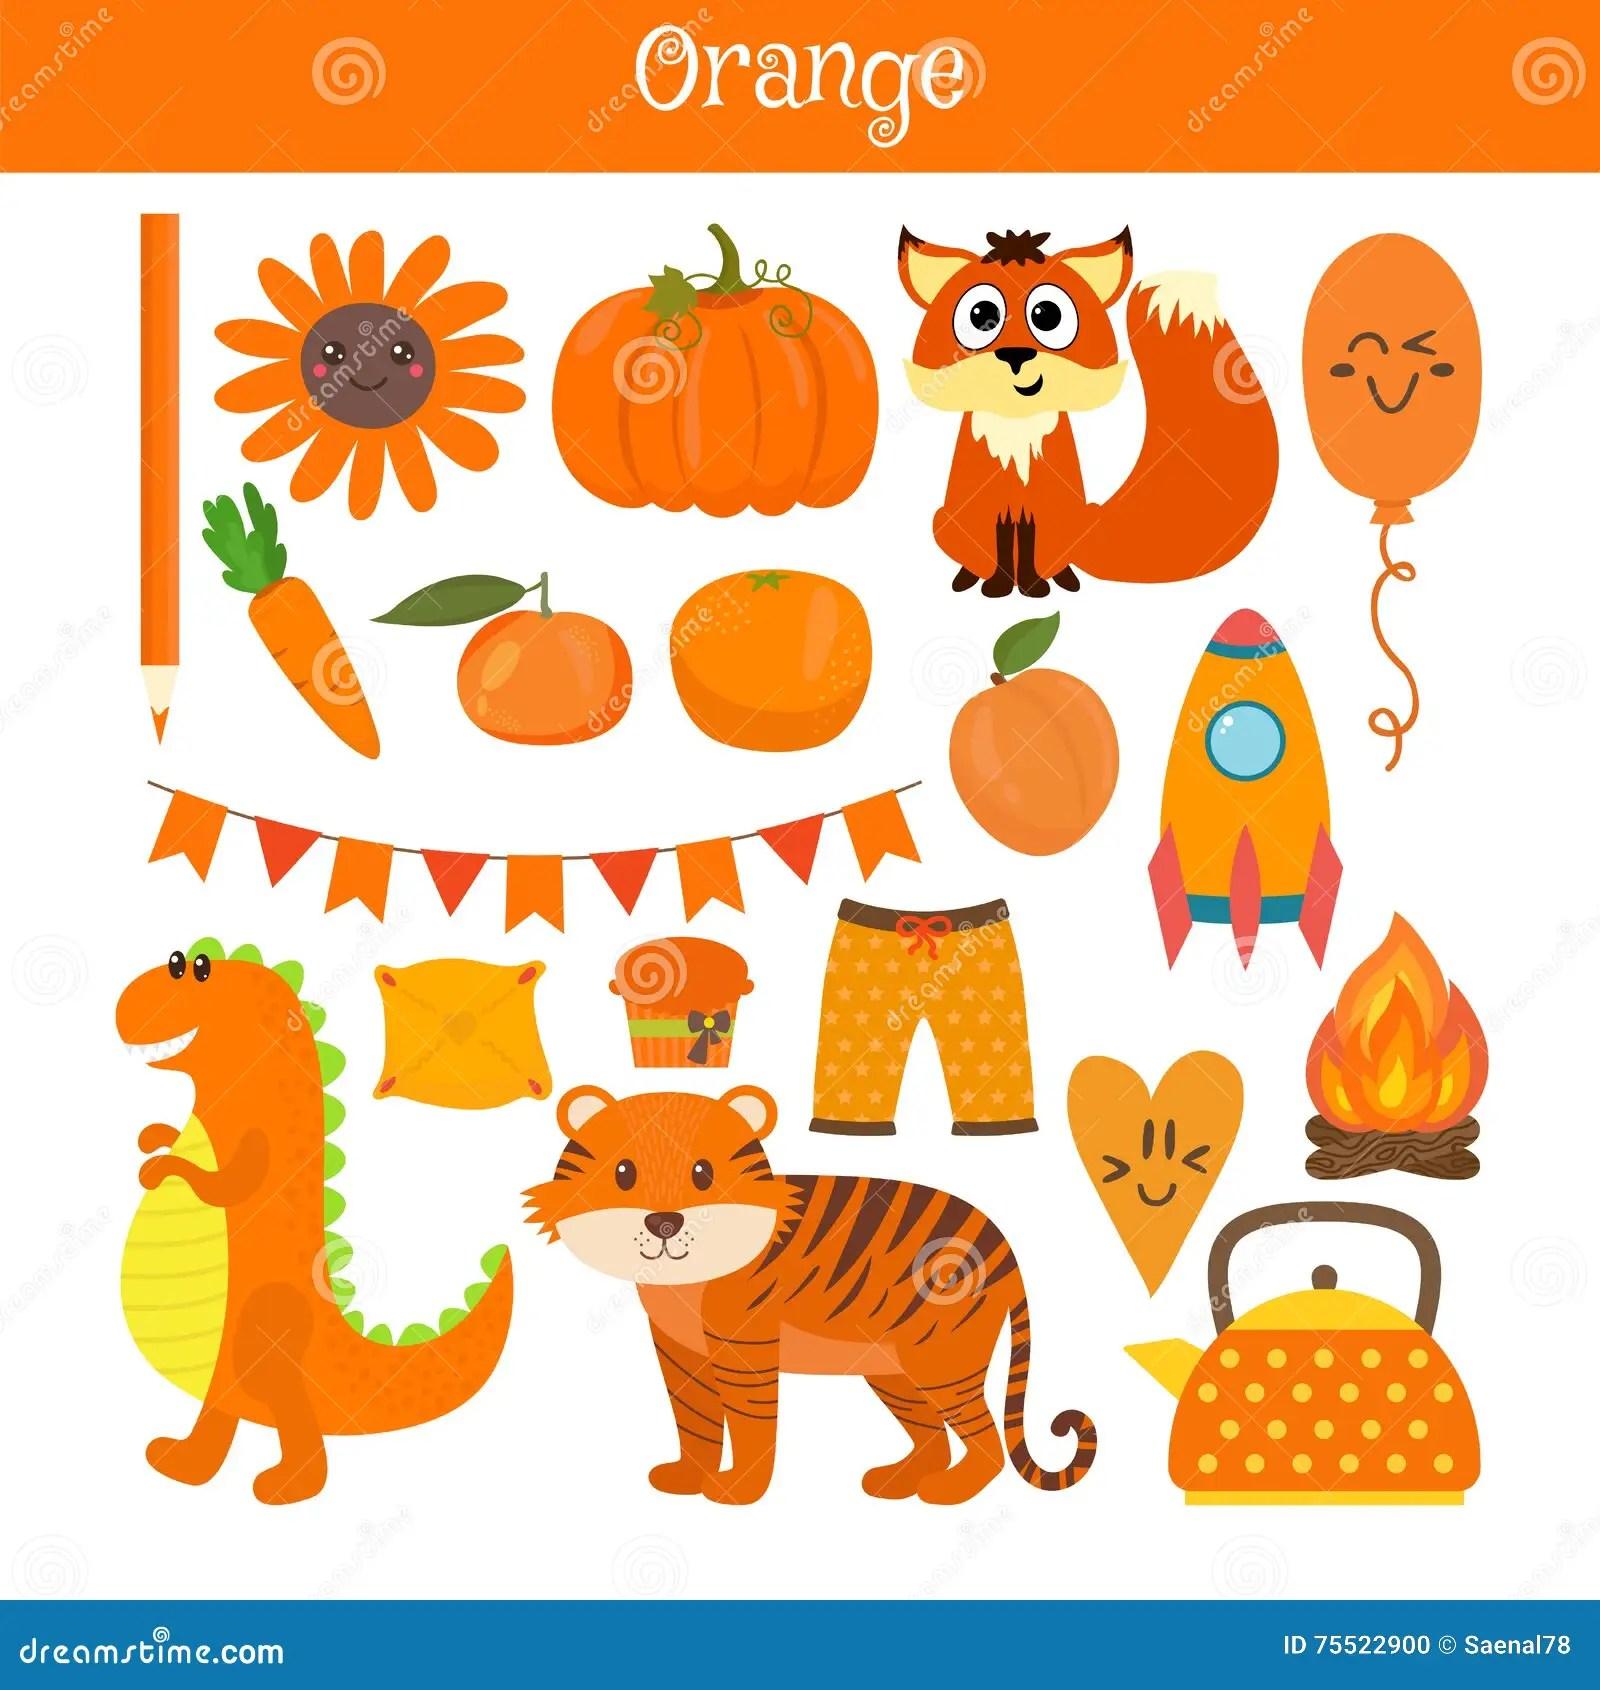 Orange Learn The Color Education Set Illustration Of